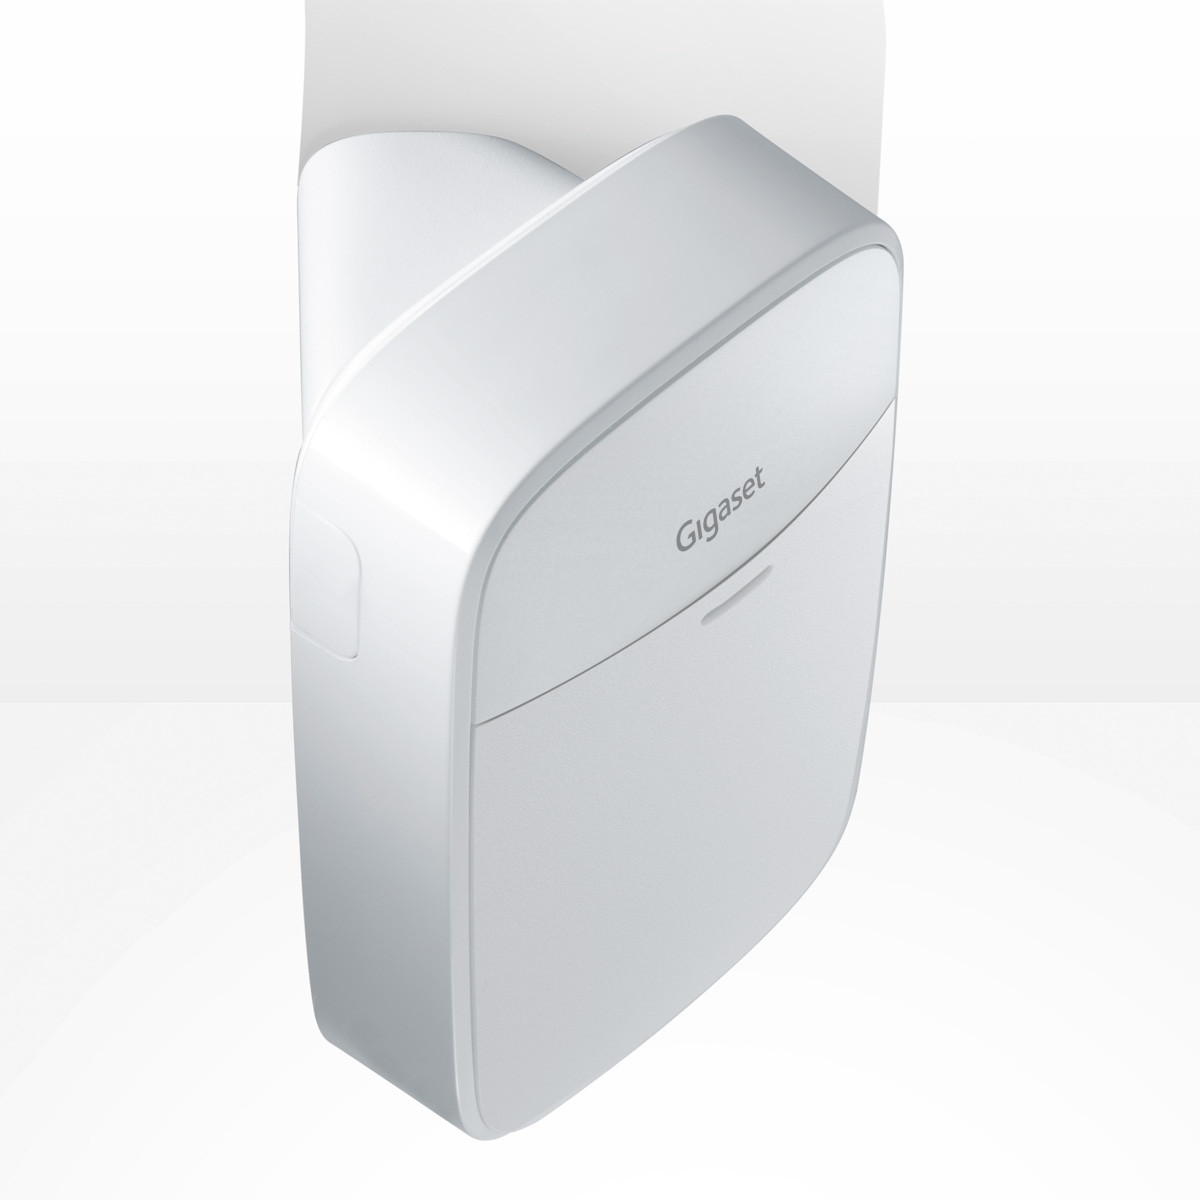 Gigaset Motion Sensor ONE X (pak van 3)